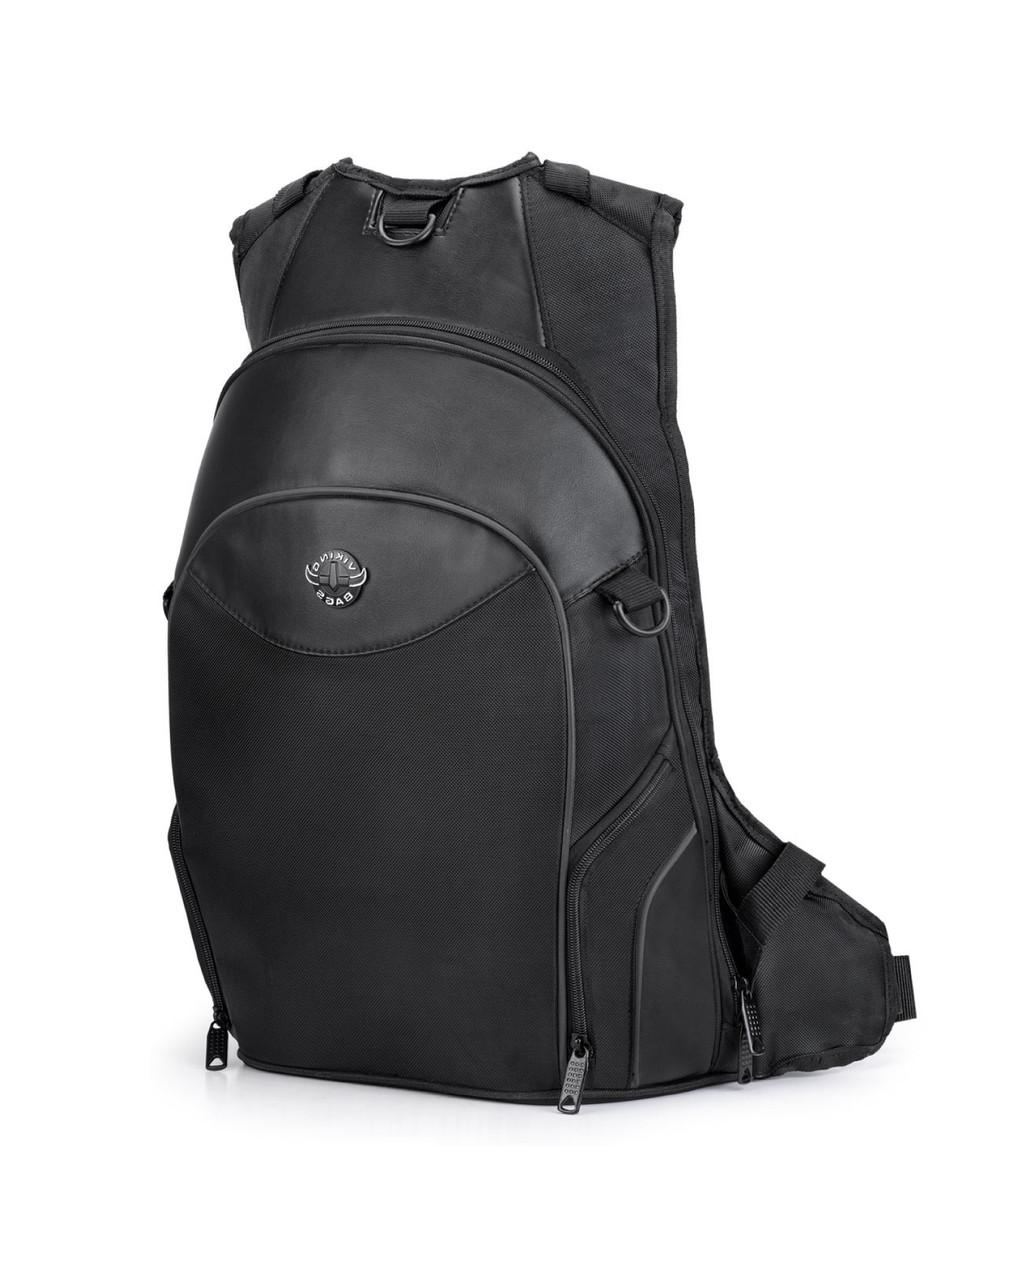 Suzuki Viking Motorcycle Medium Backpack Main Bag View